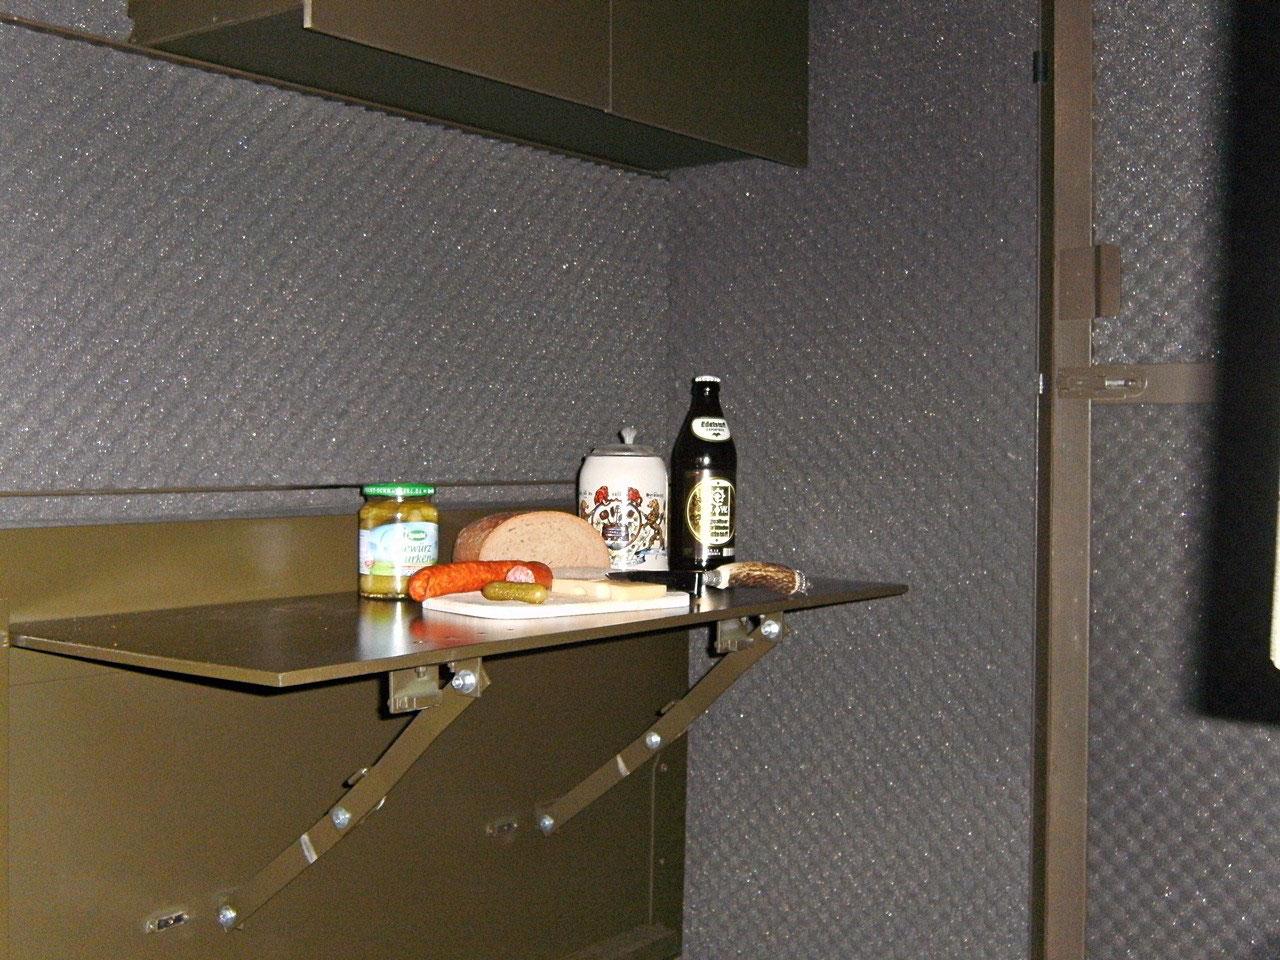 mobile schlafkanzel revierbedarf sedlmaiers webseite. Black Bedroom Furniture Sets. Home Design Ideas